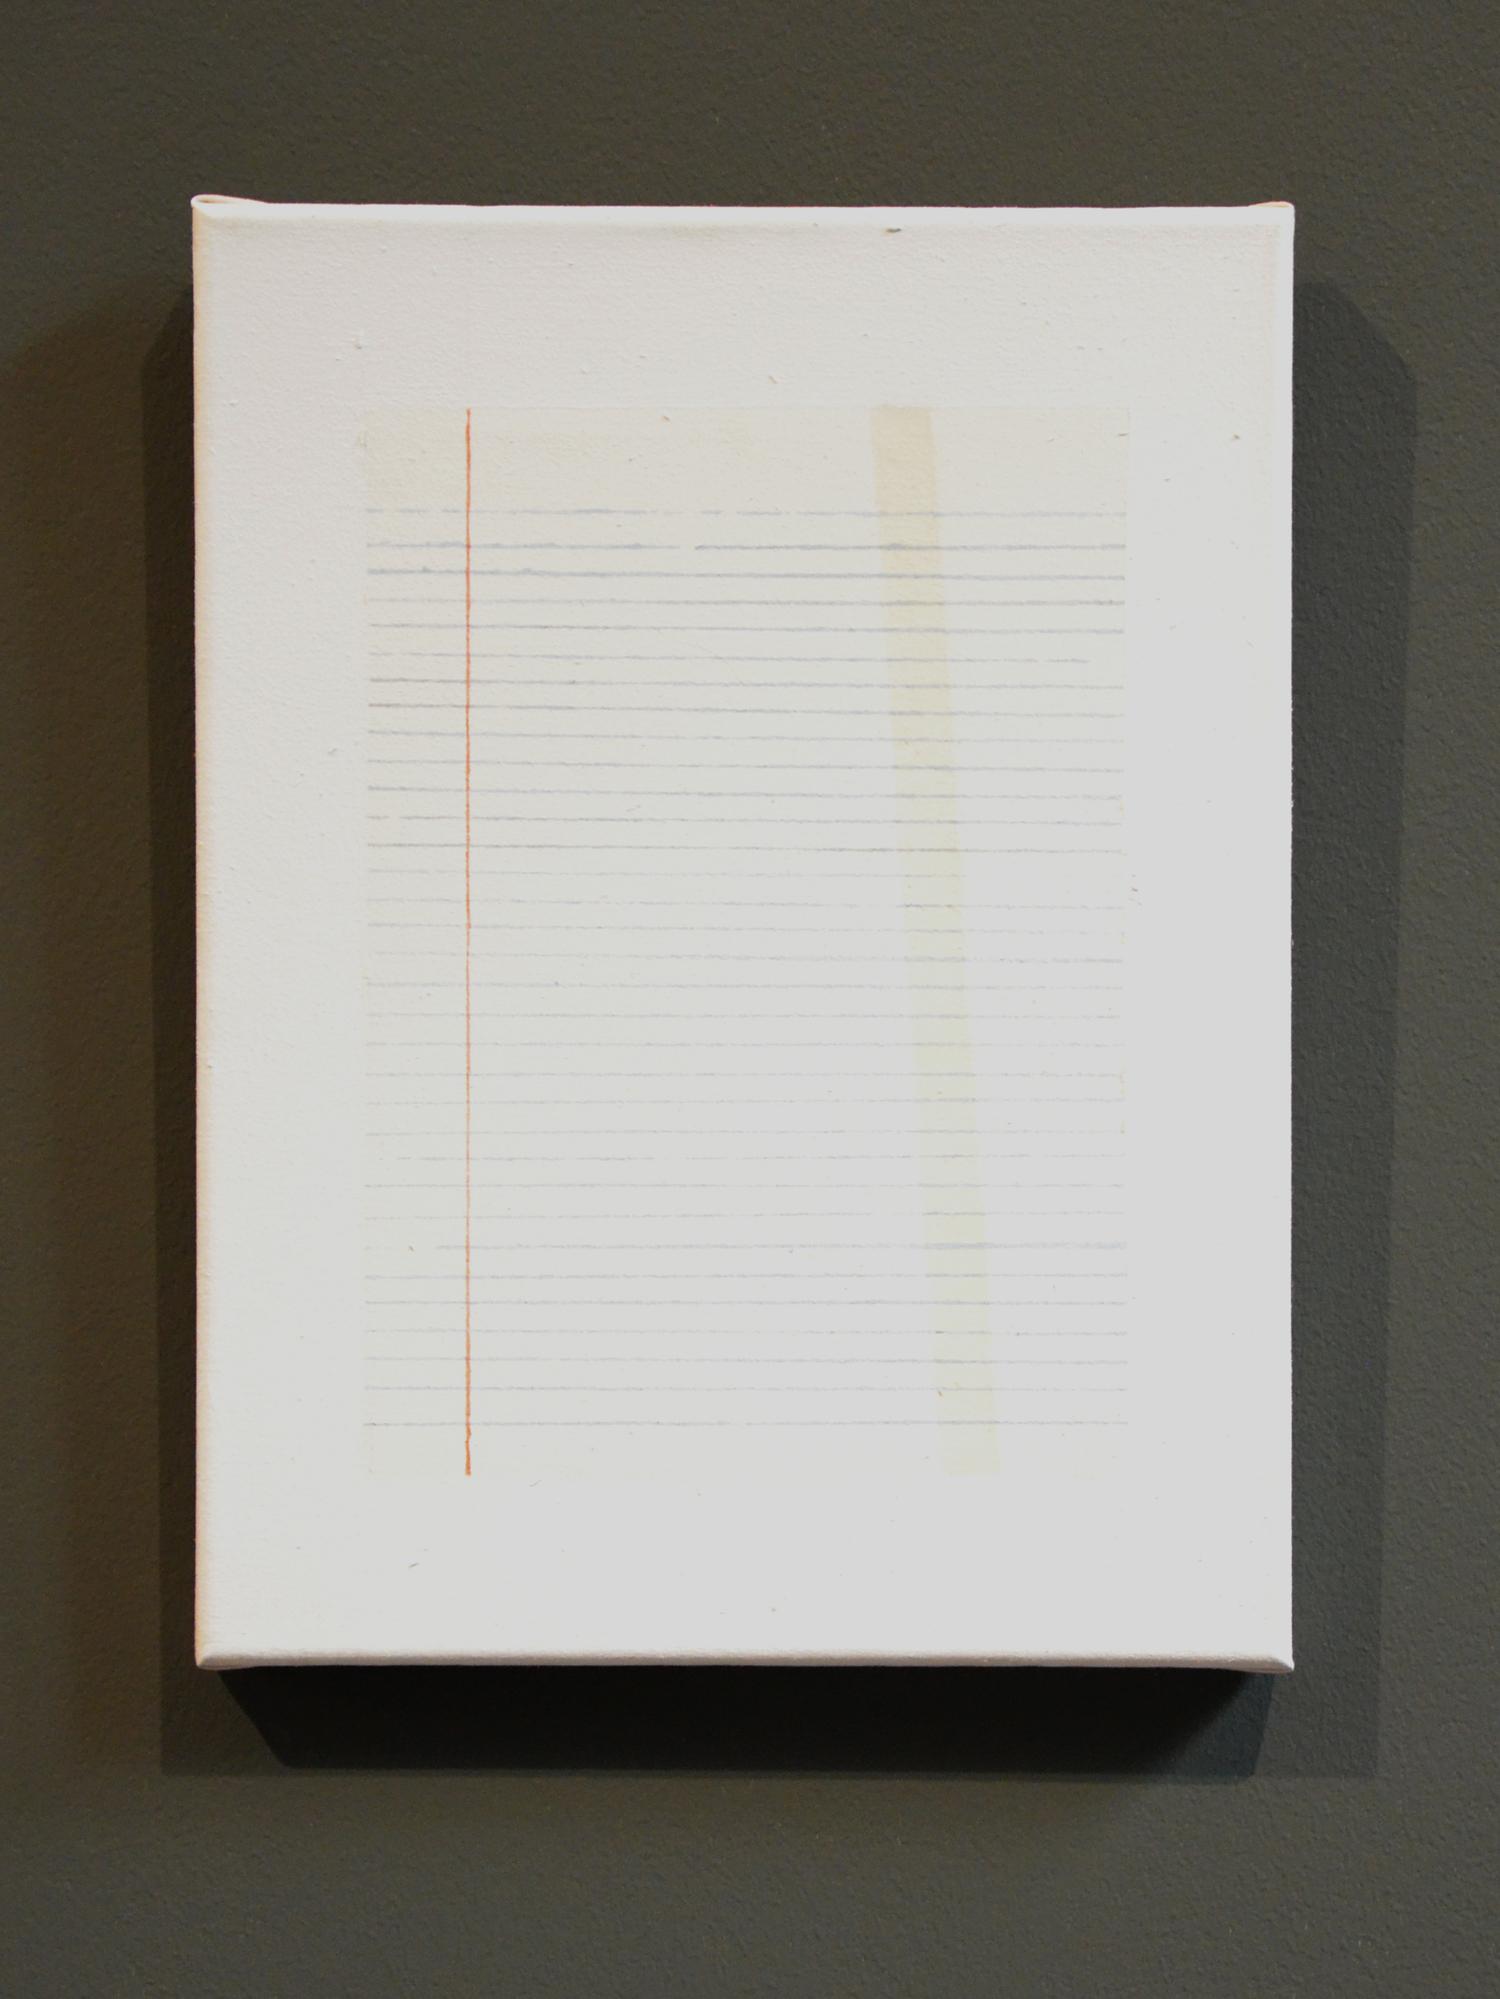 Jeffrey Dunsbergen-A4-40x50cm-2012